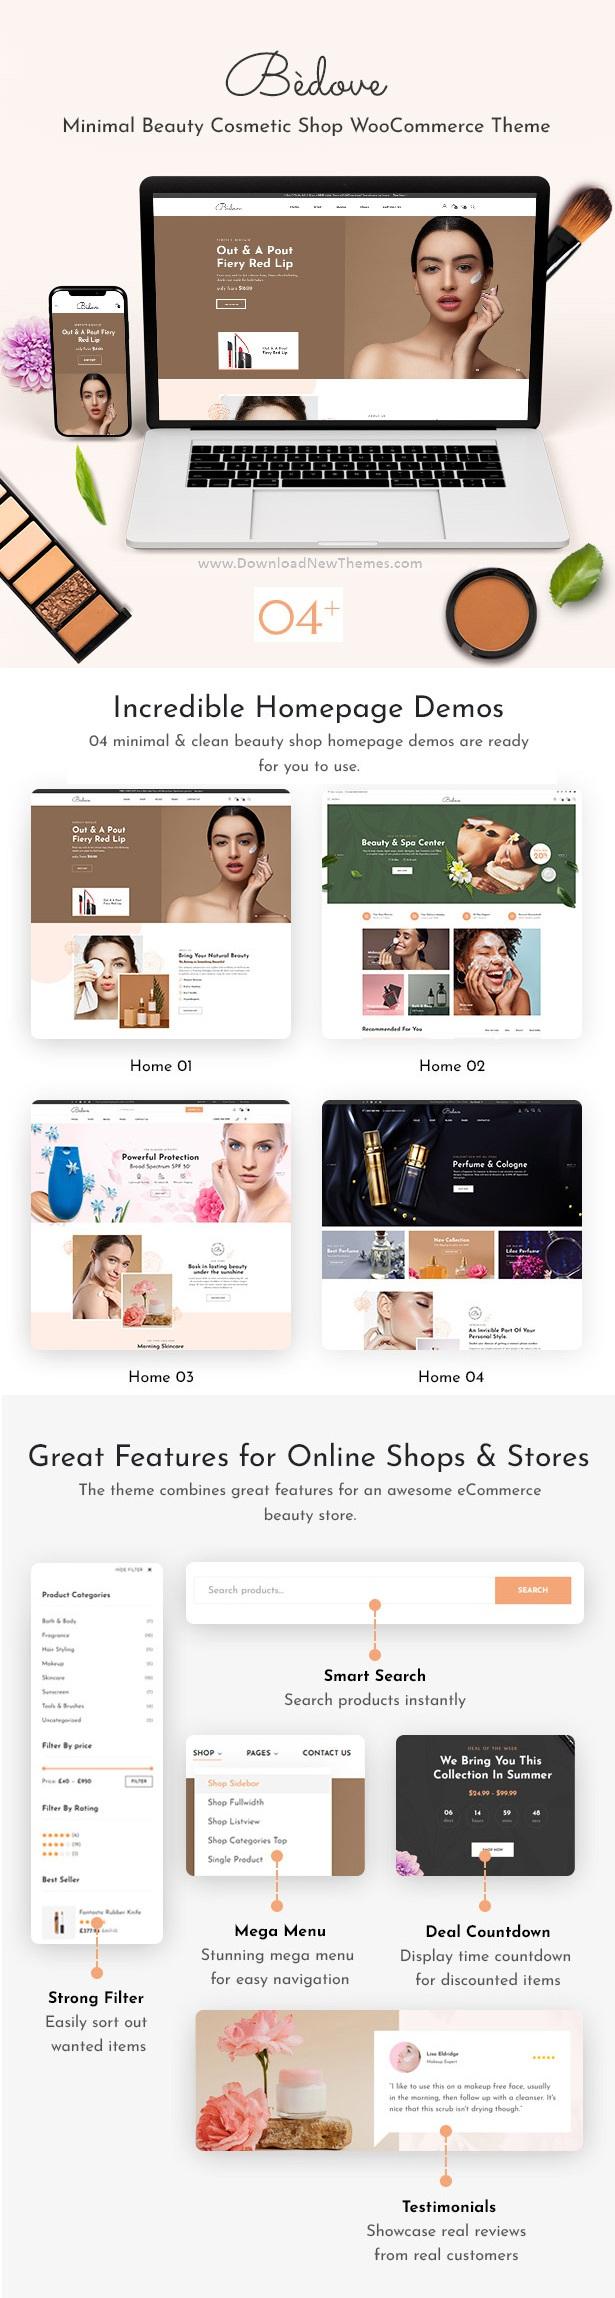 Beauty & Cosmetics Shop WordPress Theme